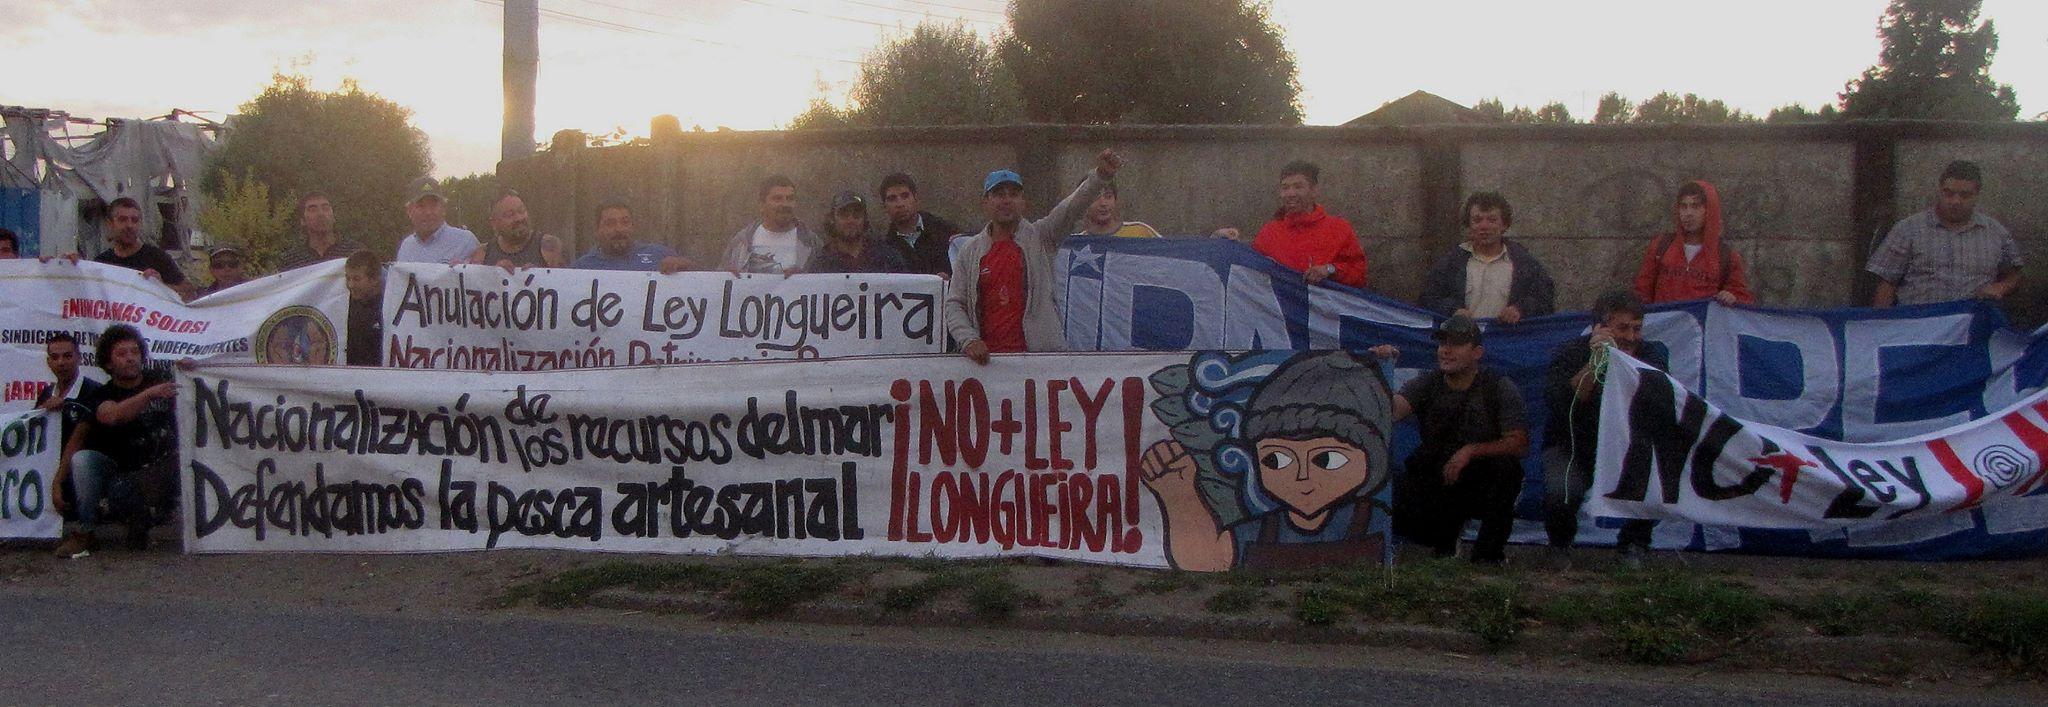 ley-longueira-2015-ok